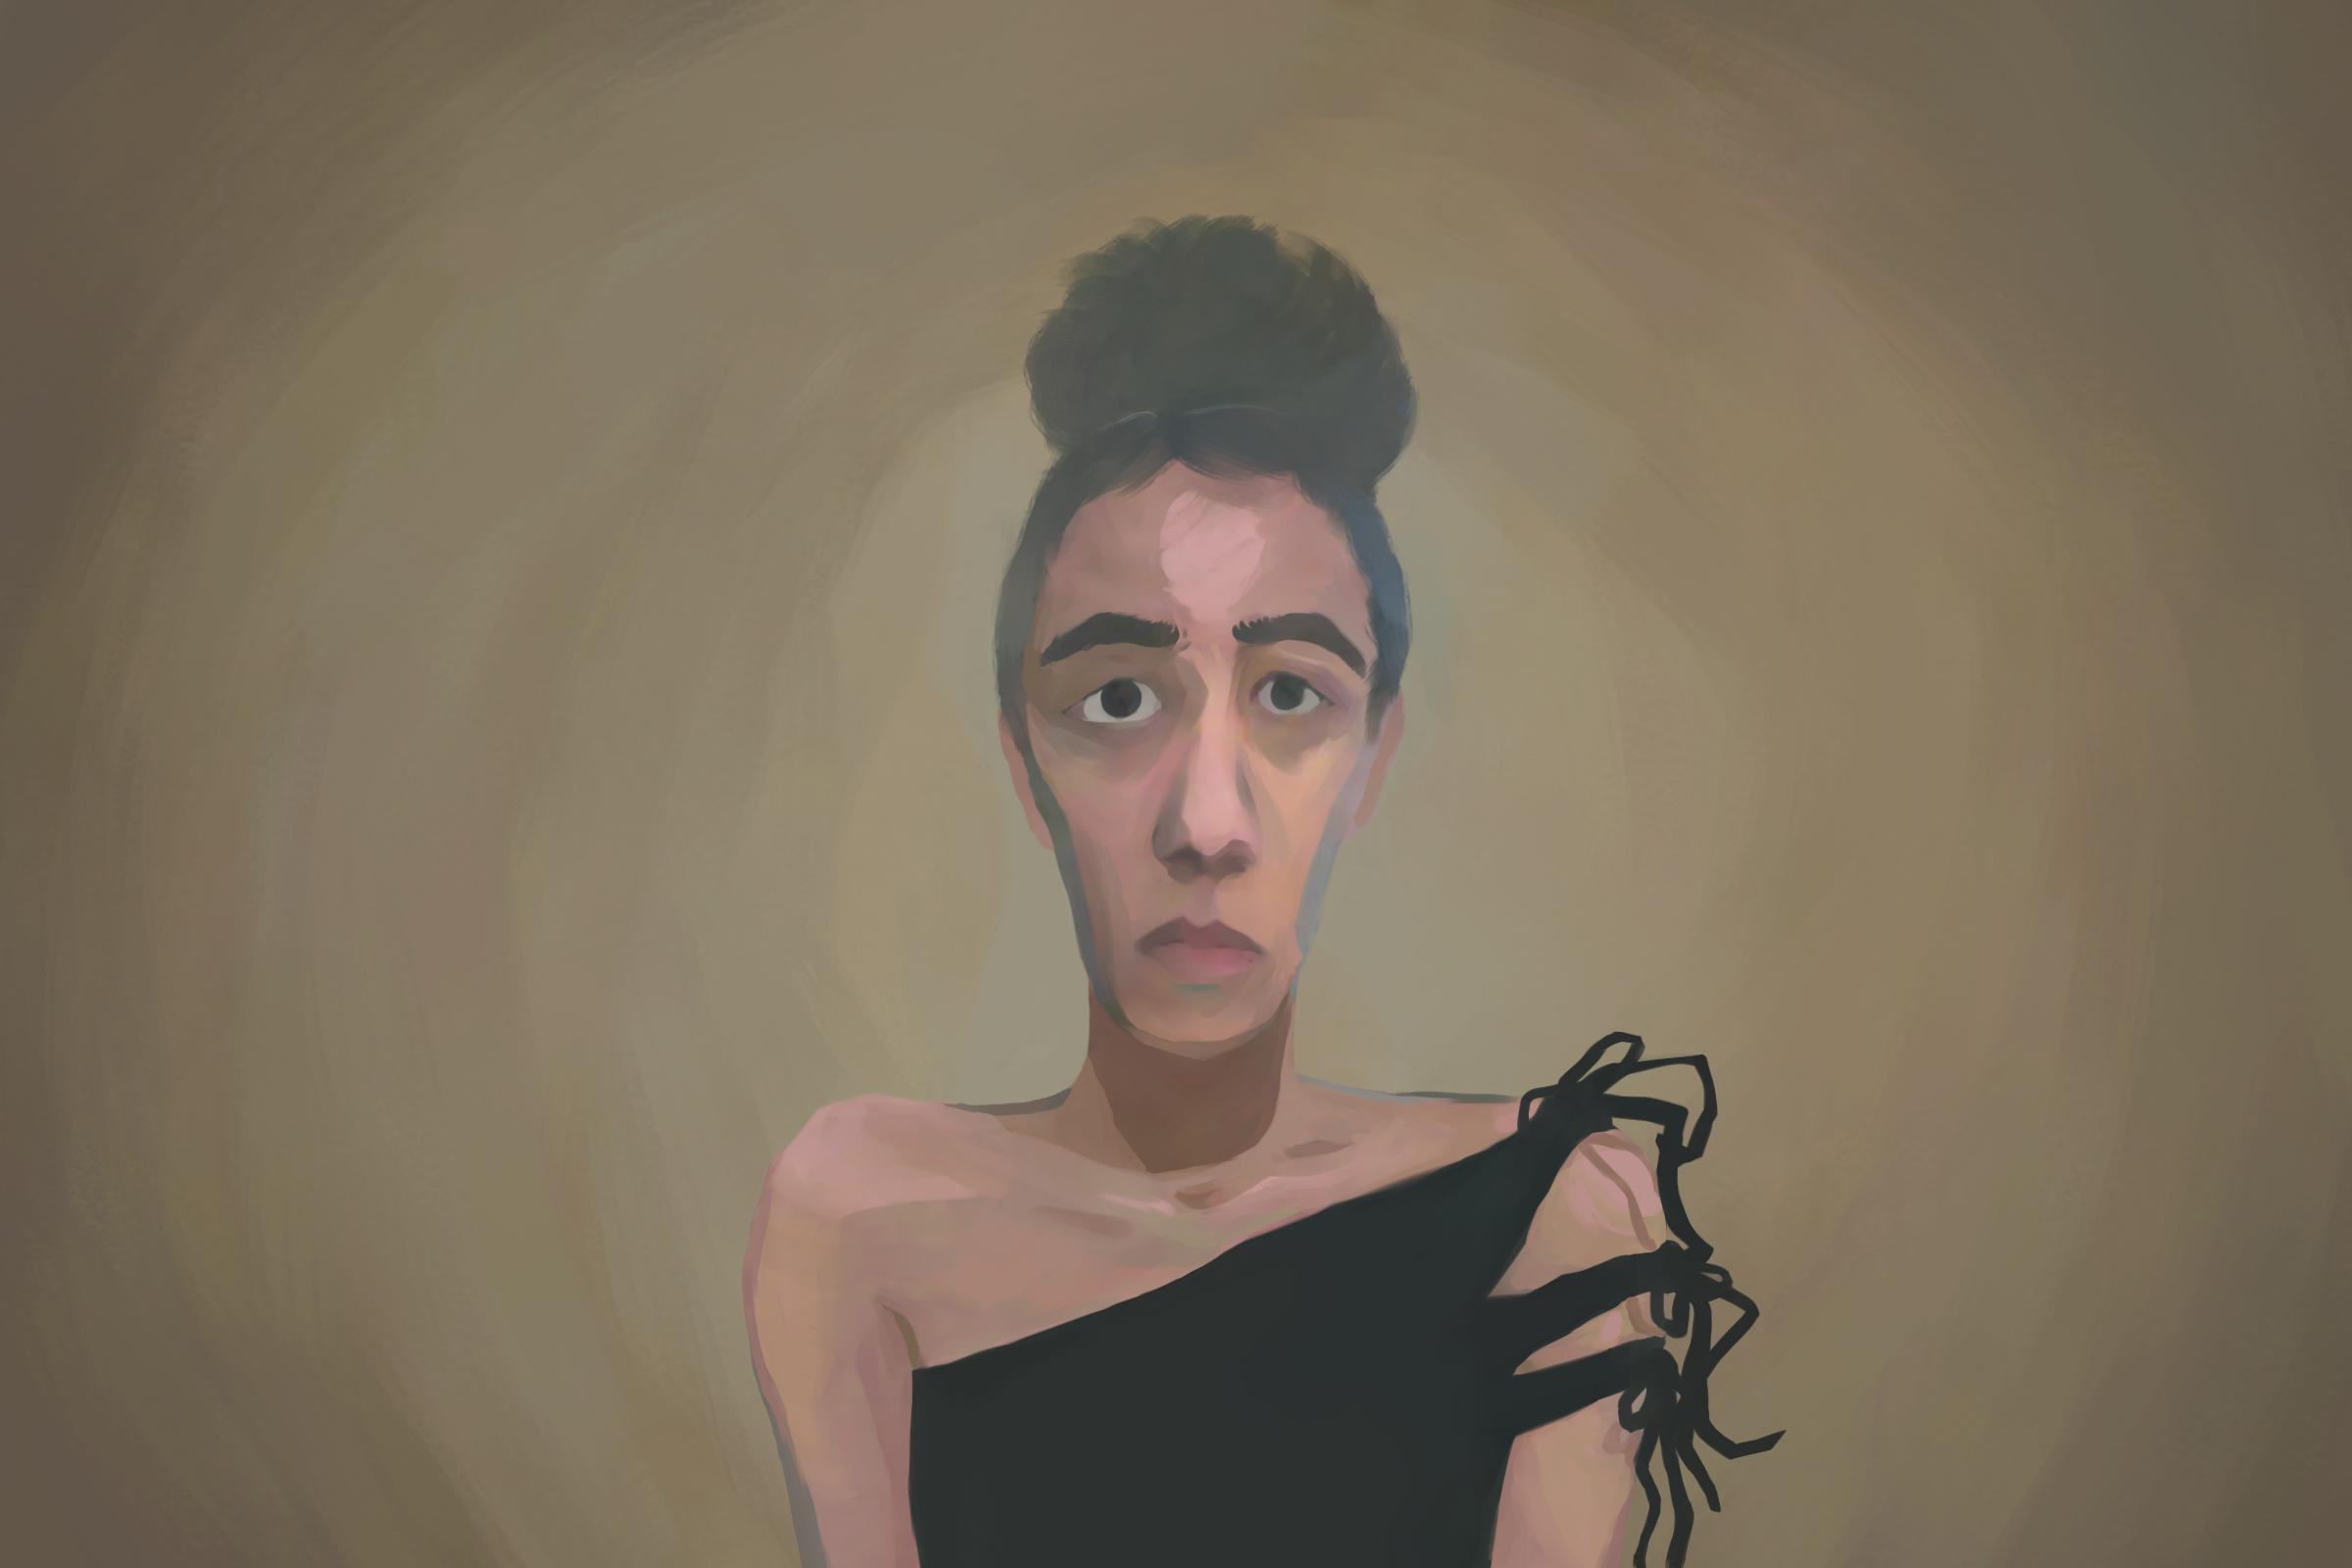 Self-portrait by Clara Mejías